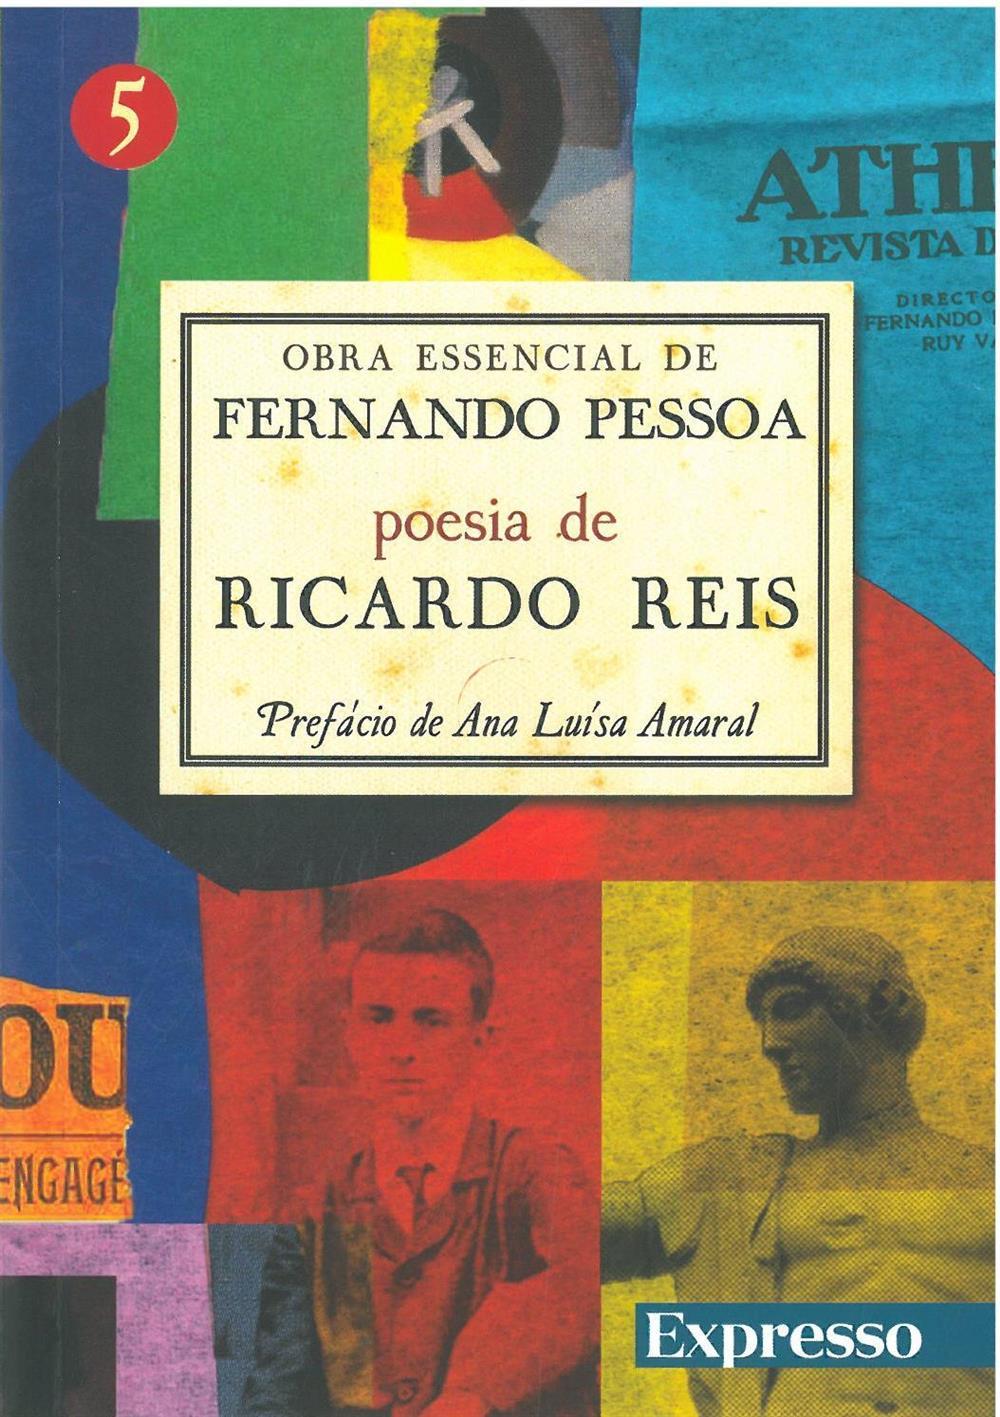 Poesia de Ricardo Reis_.jpg